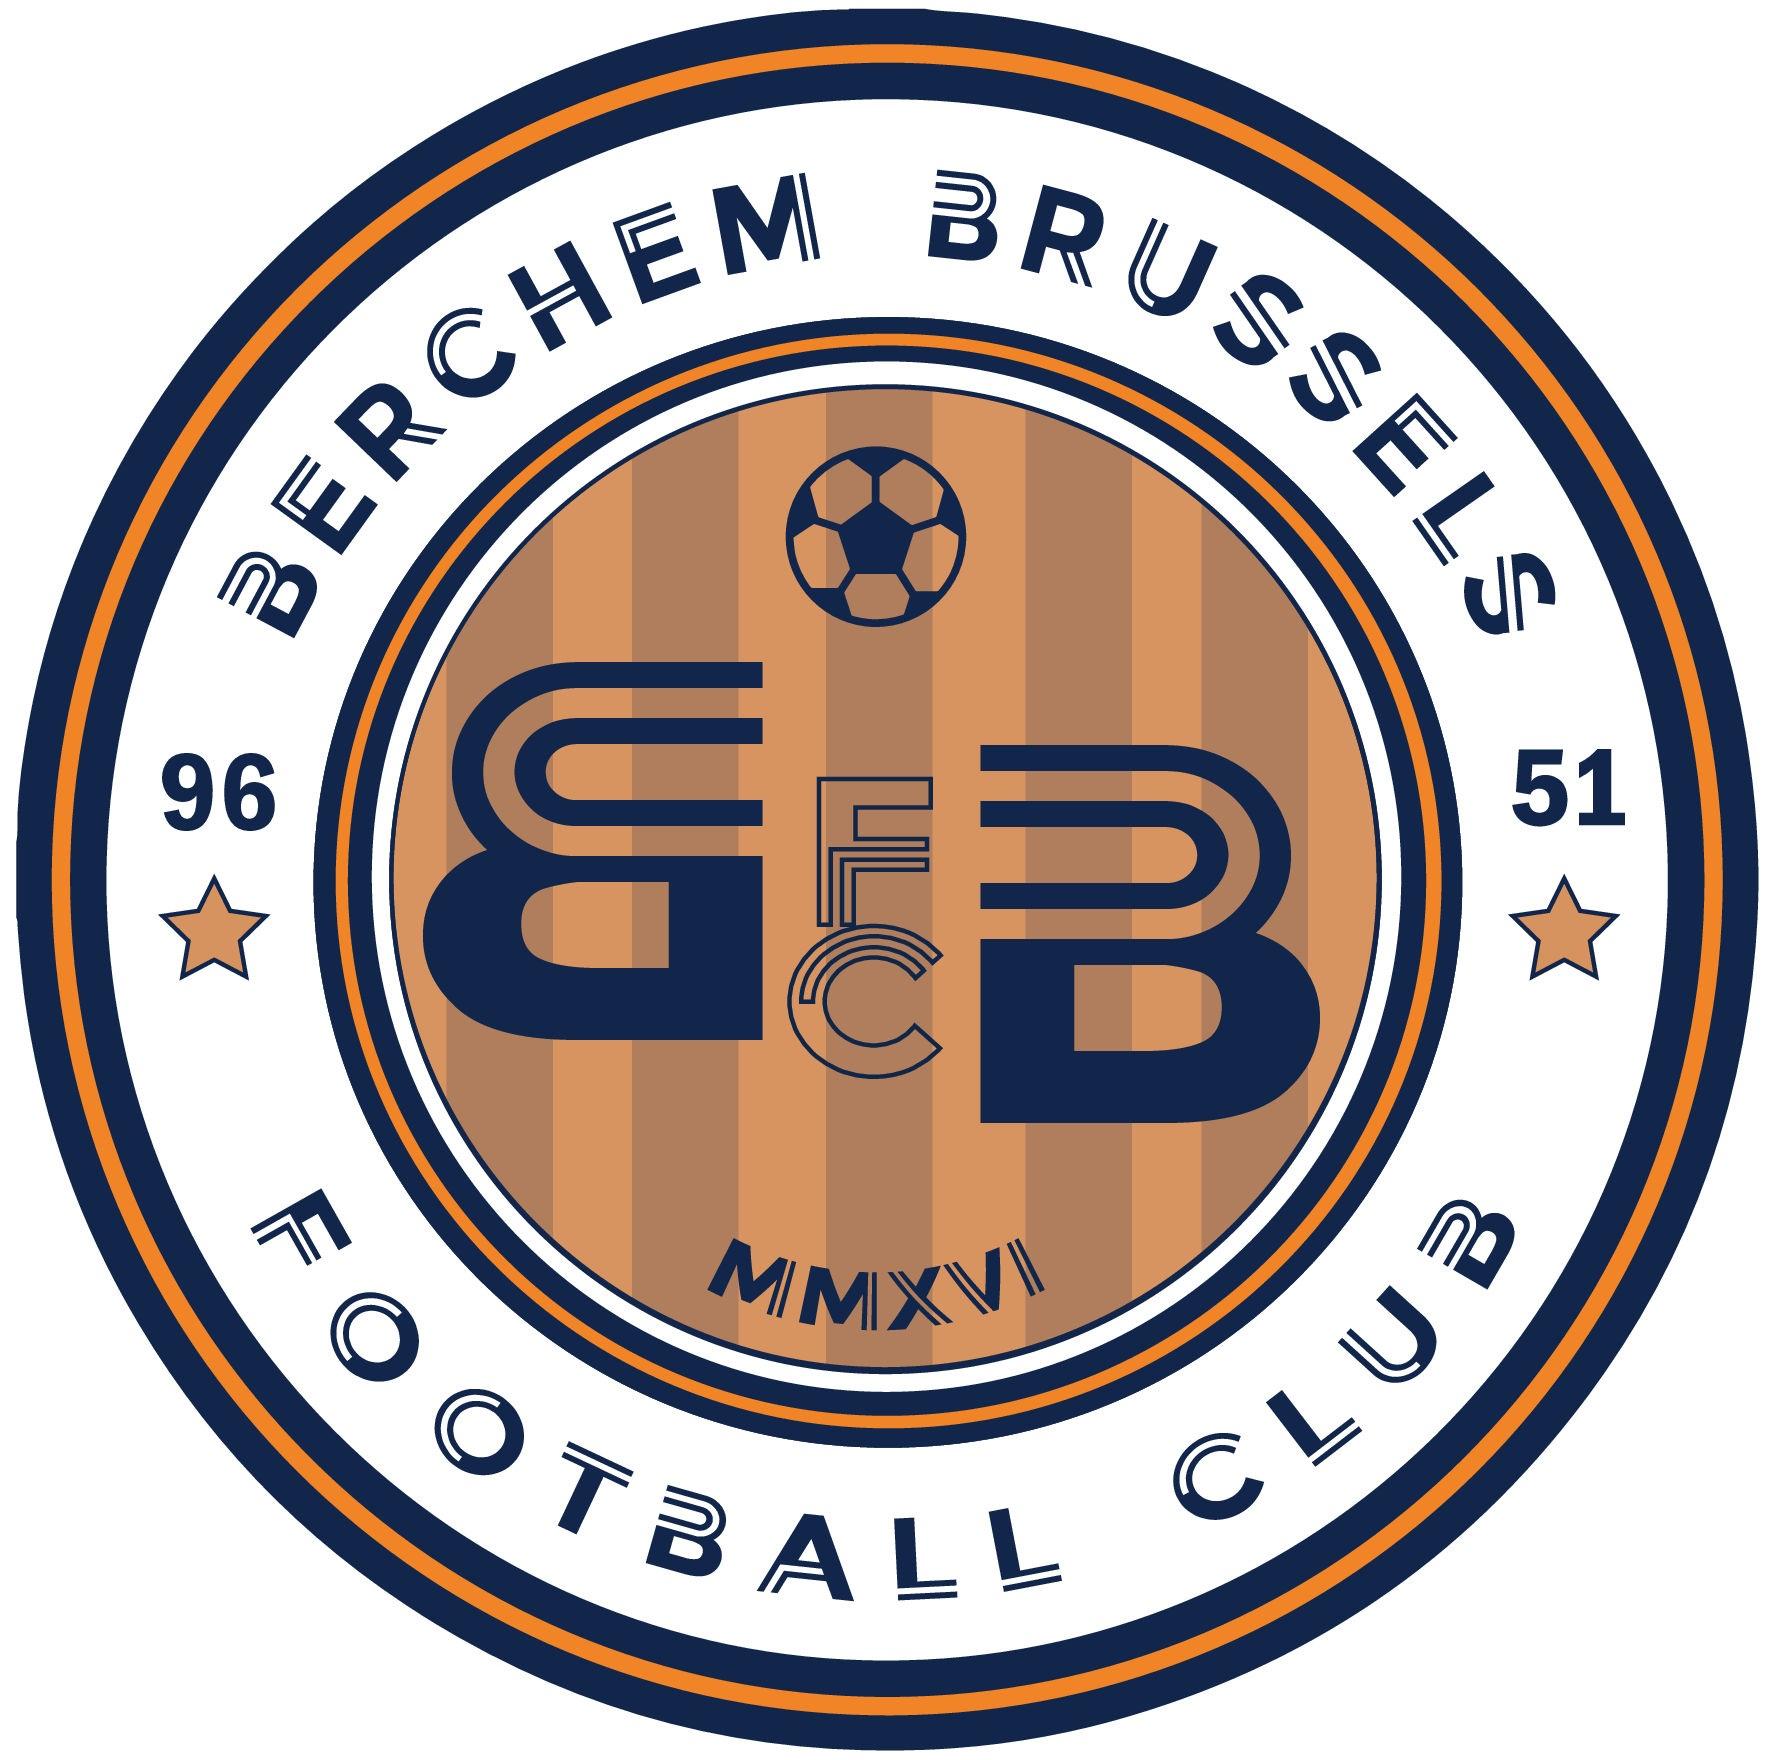 4 - Brussels Sport AFCA A